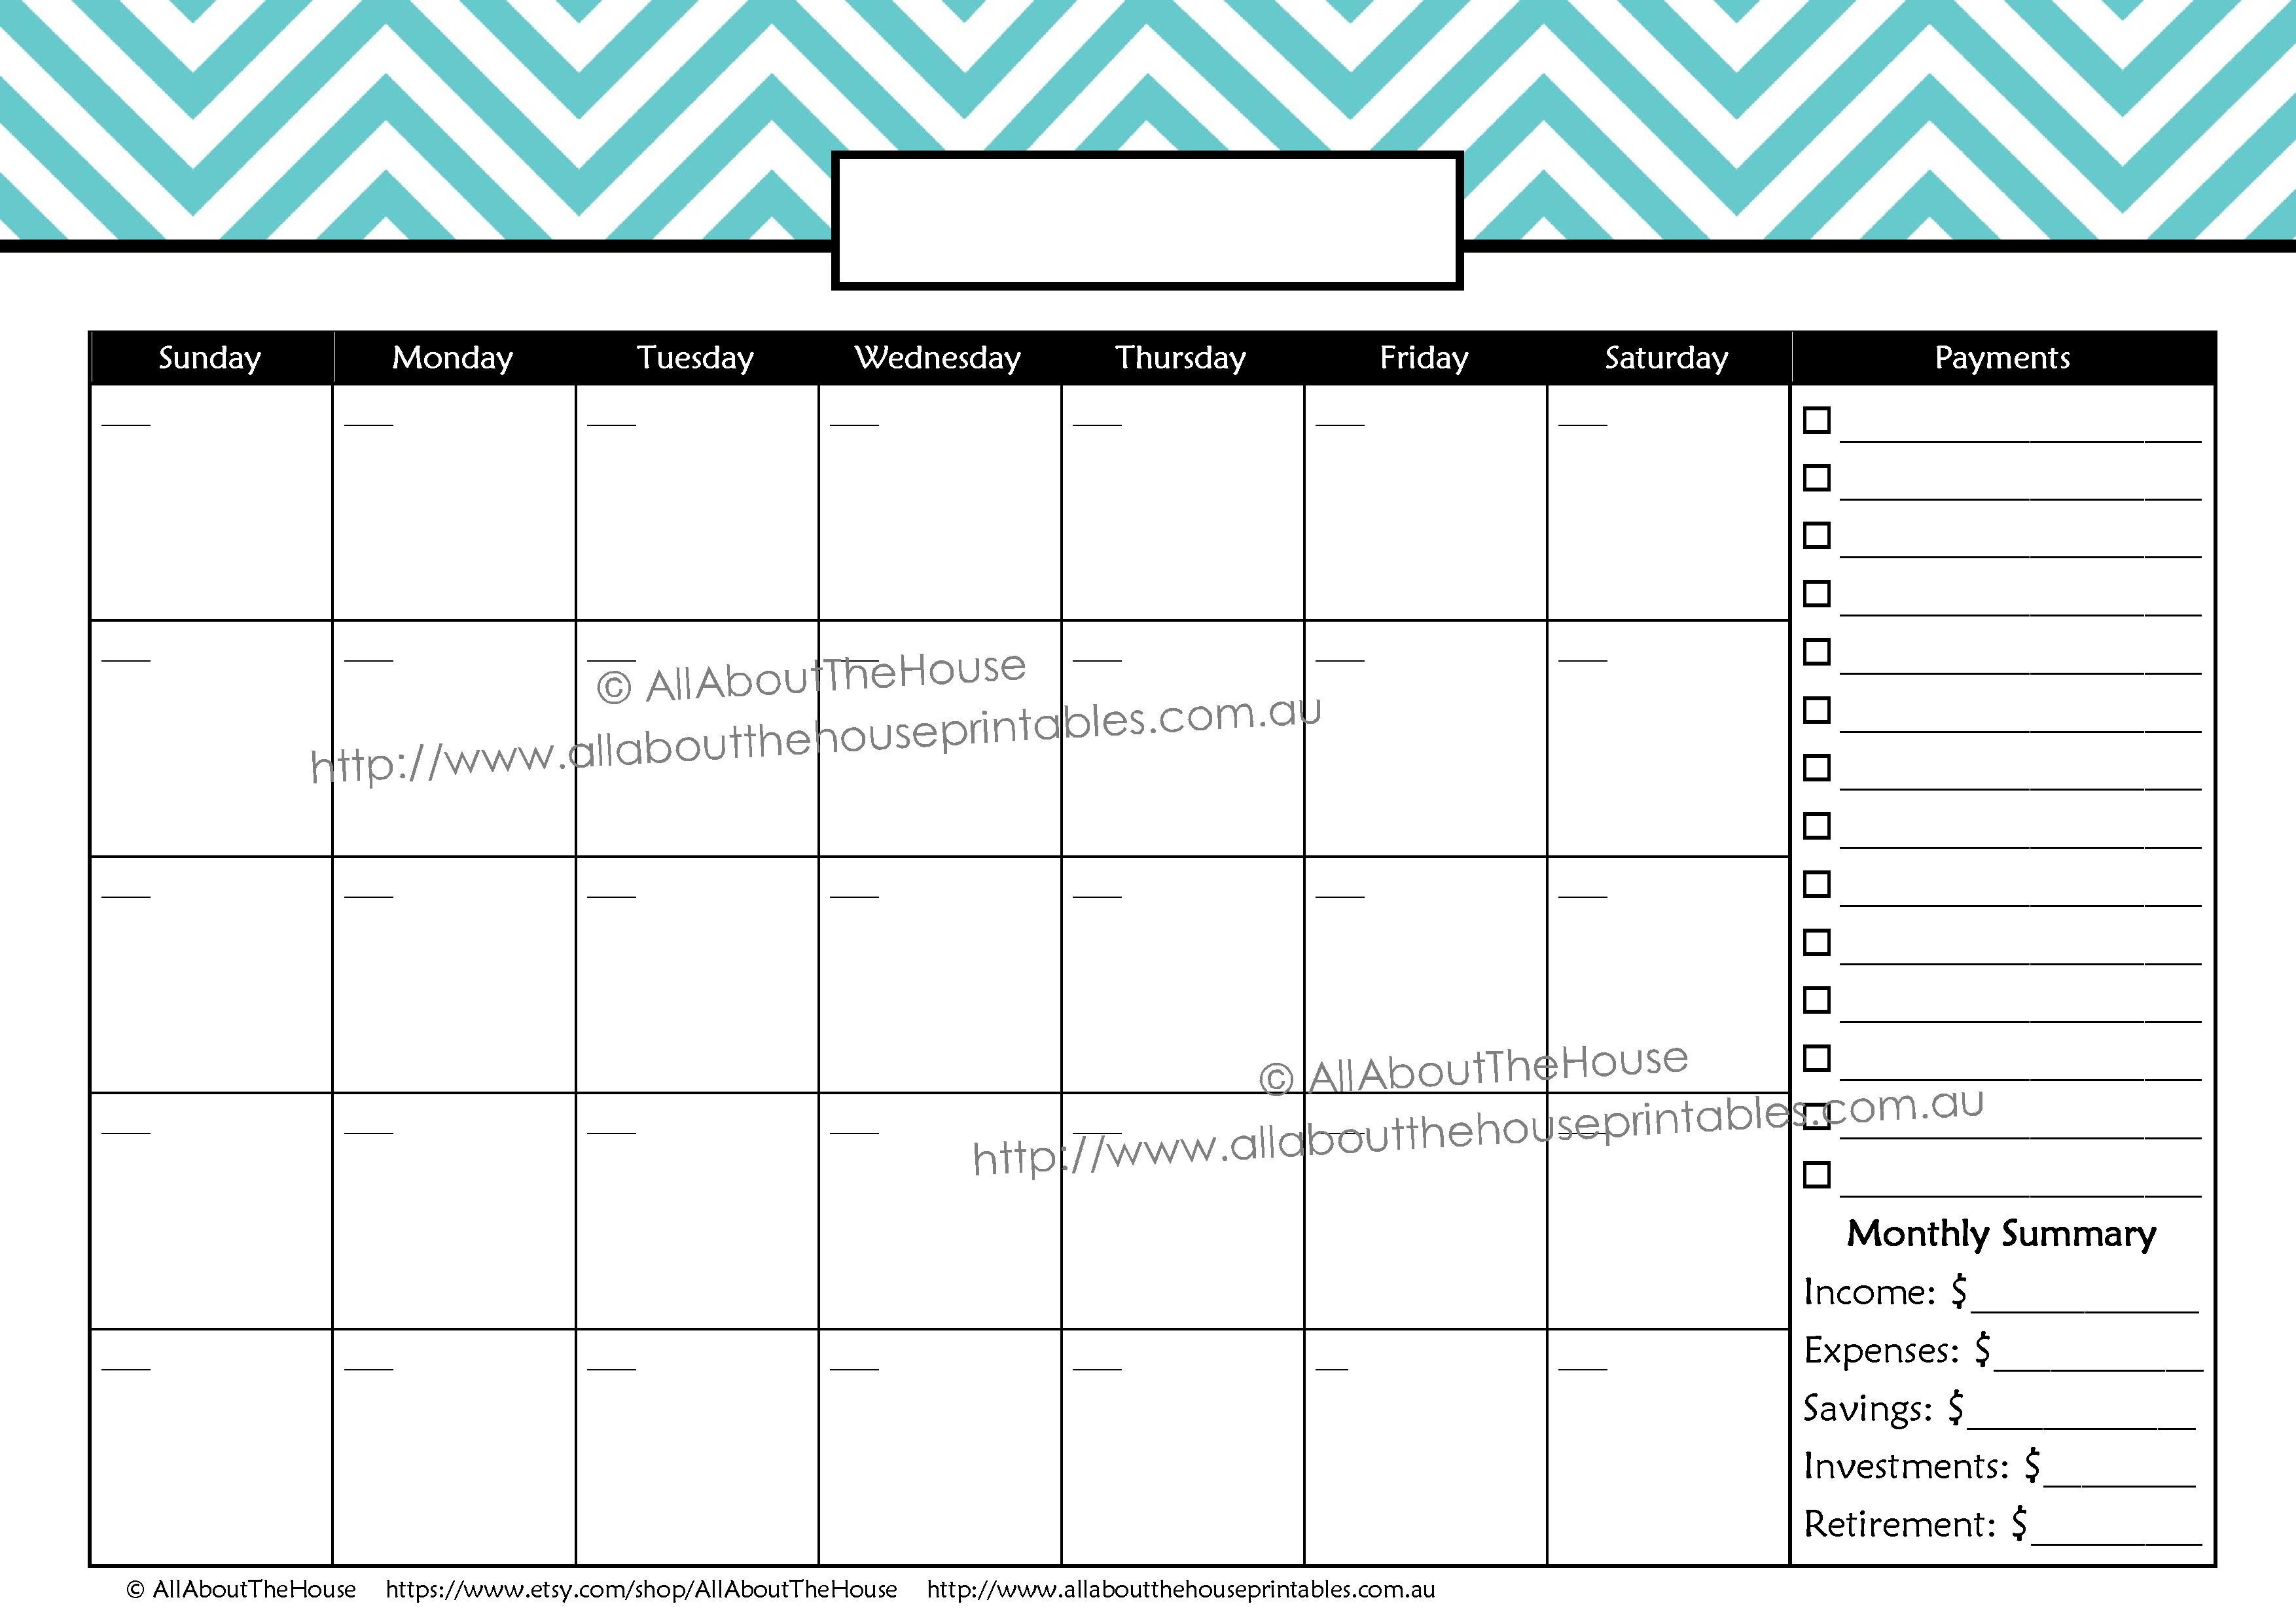 Printable Calendar for Bills Allaboutthehouse Printables